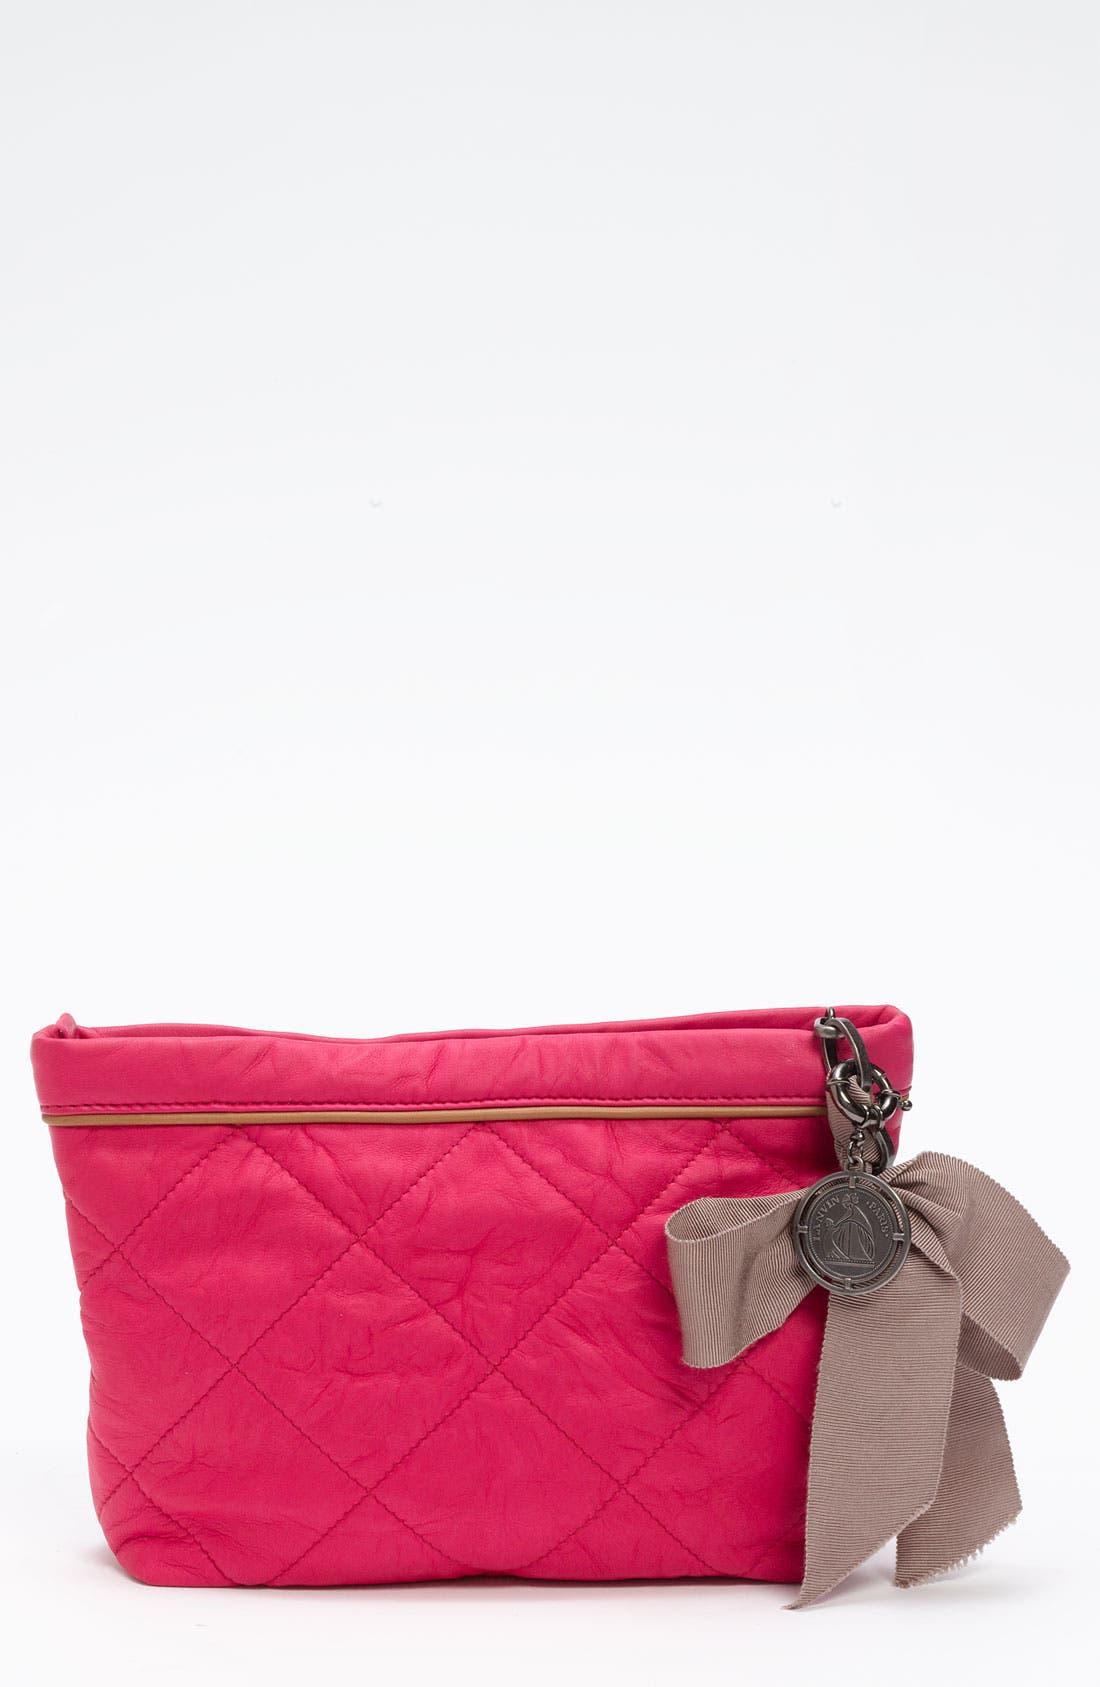 Main Image - Lanvin 'Amalia' Leather Pouchette